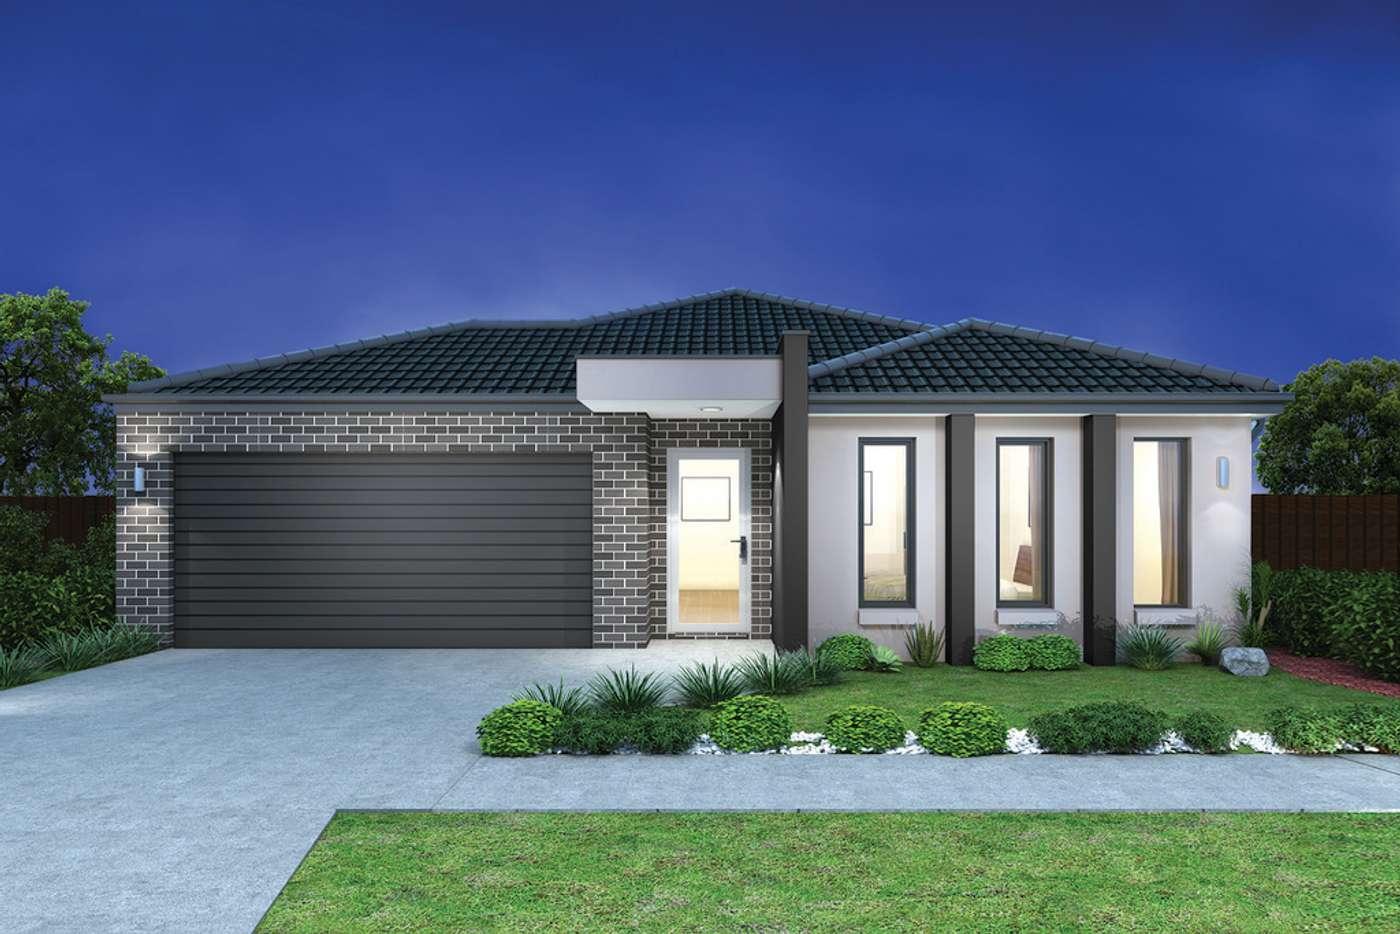 Main view of Homely house listing, 711 Truganina Albright Estate, Truganina VIC 3029